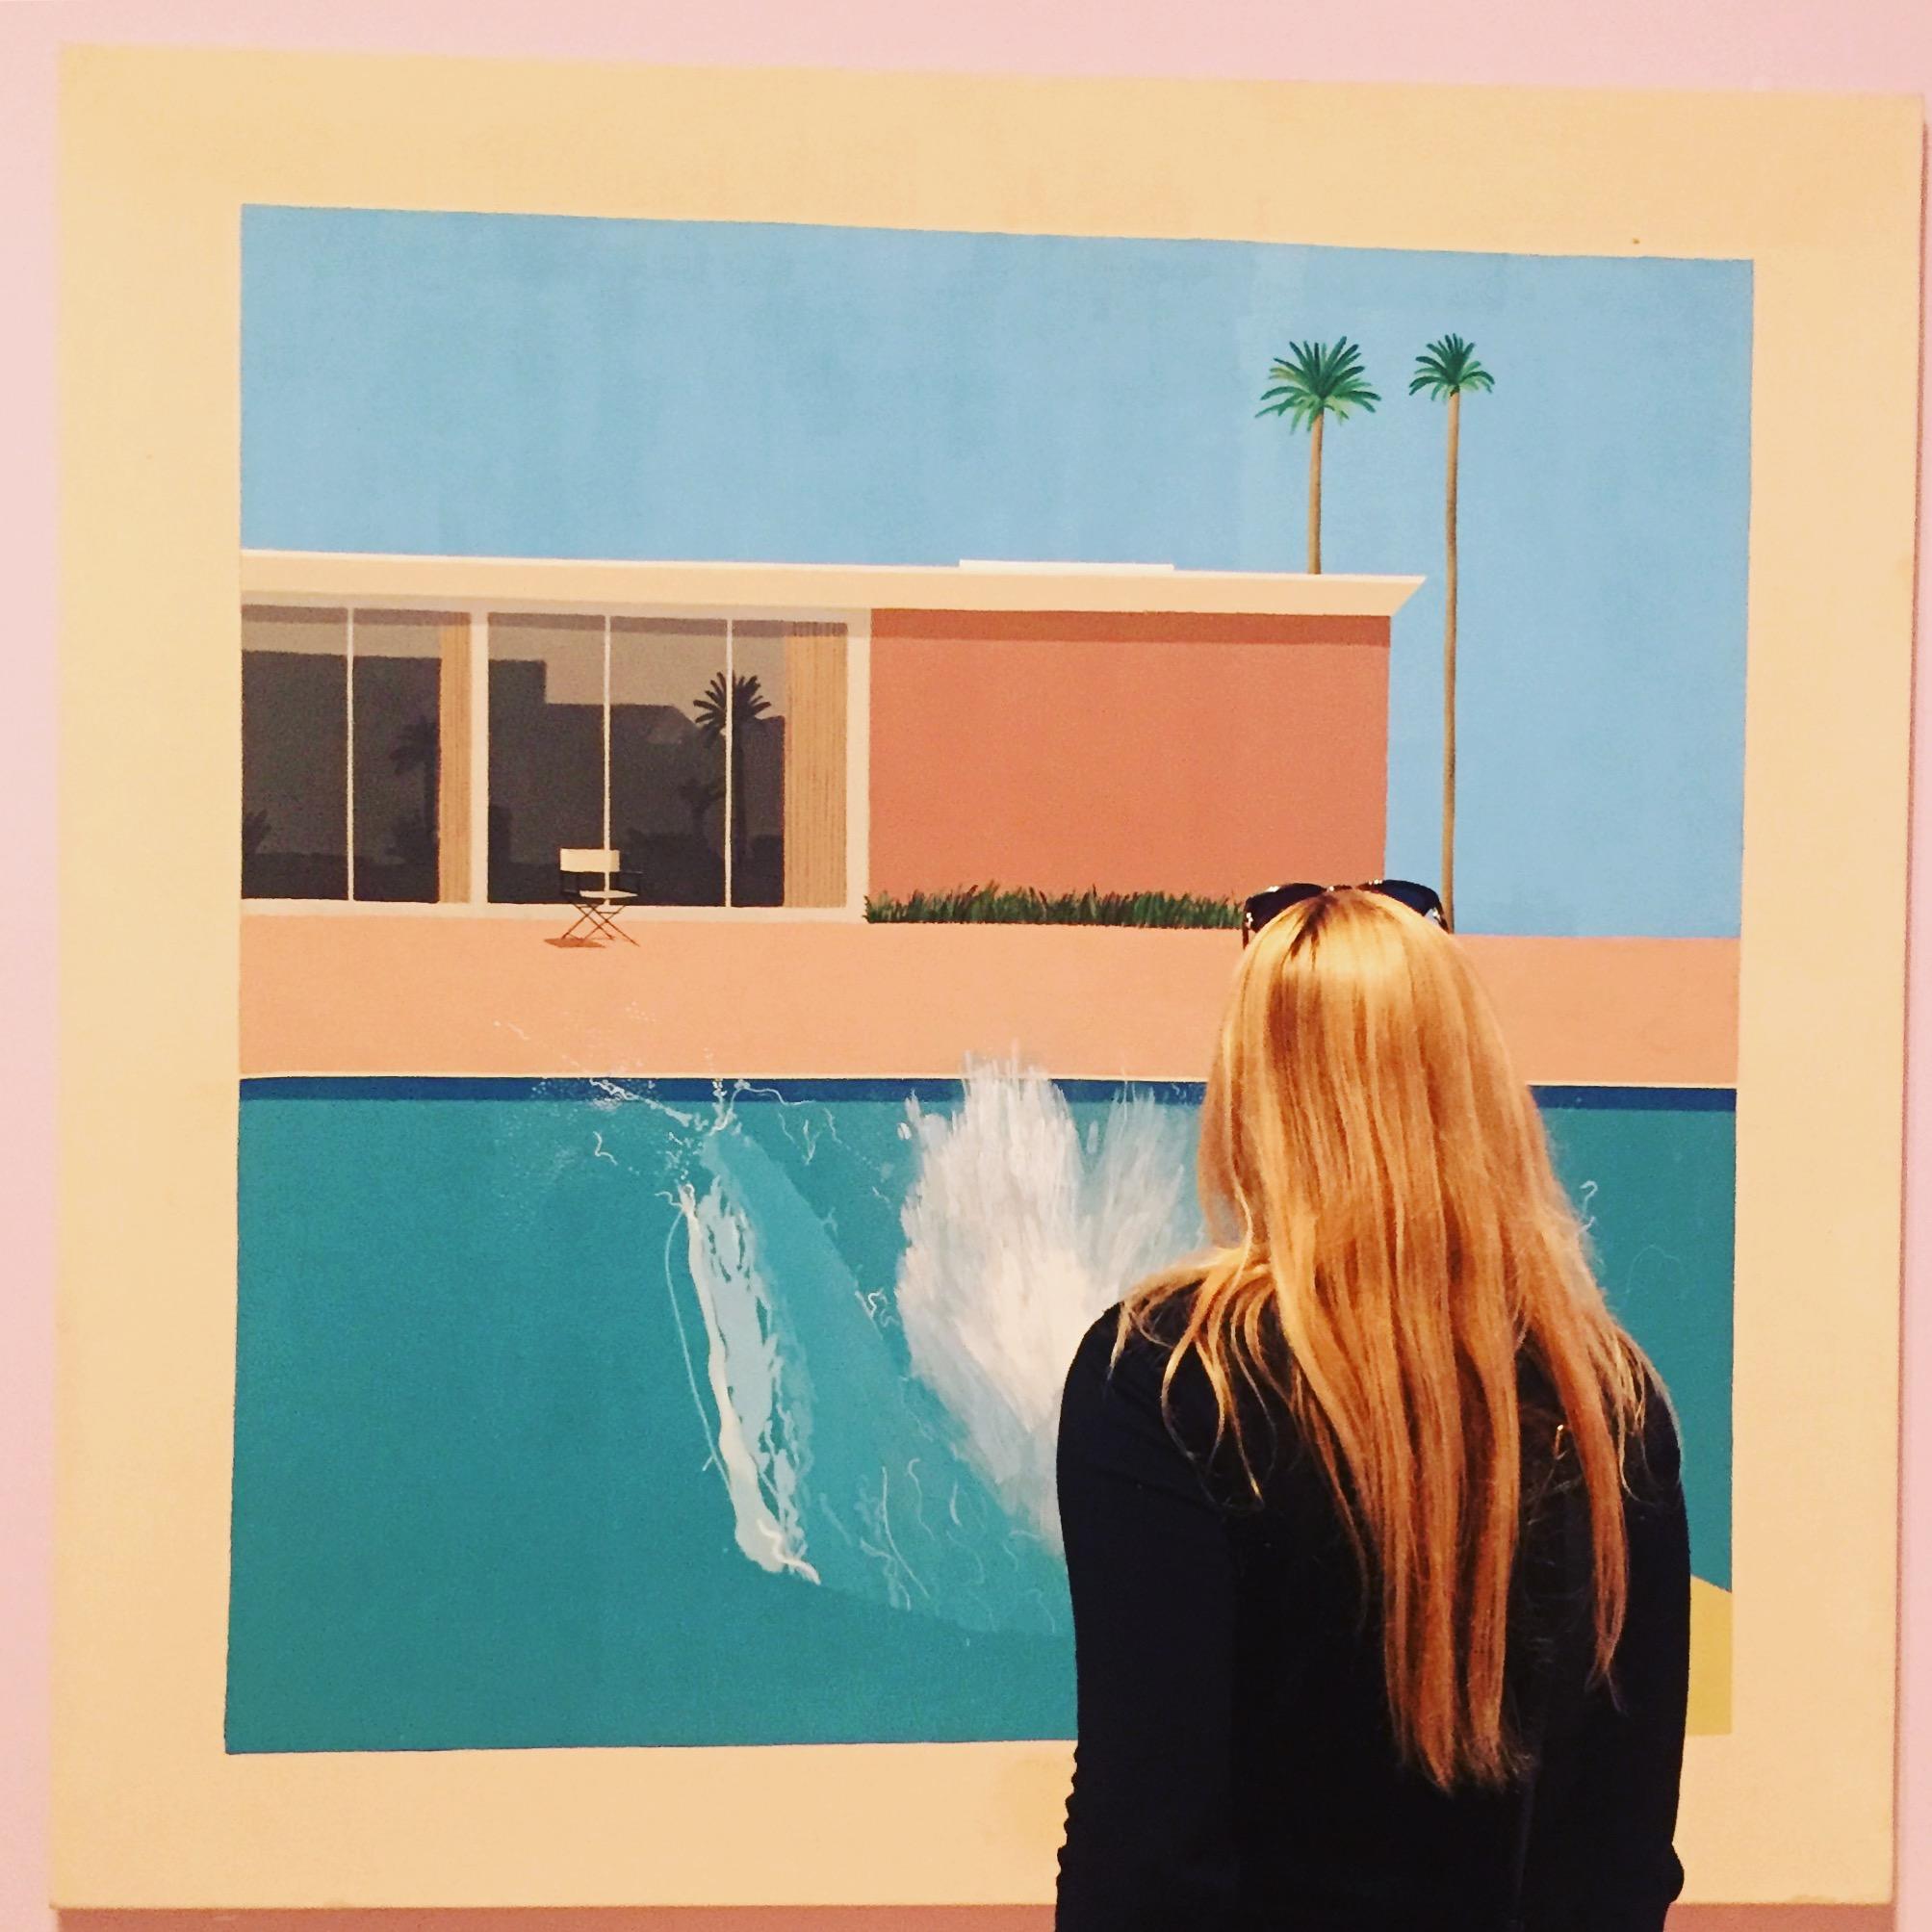 David Hockney | The Tate Britain